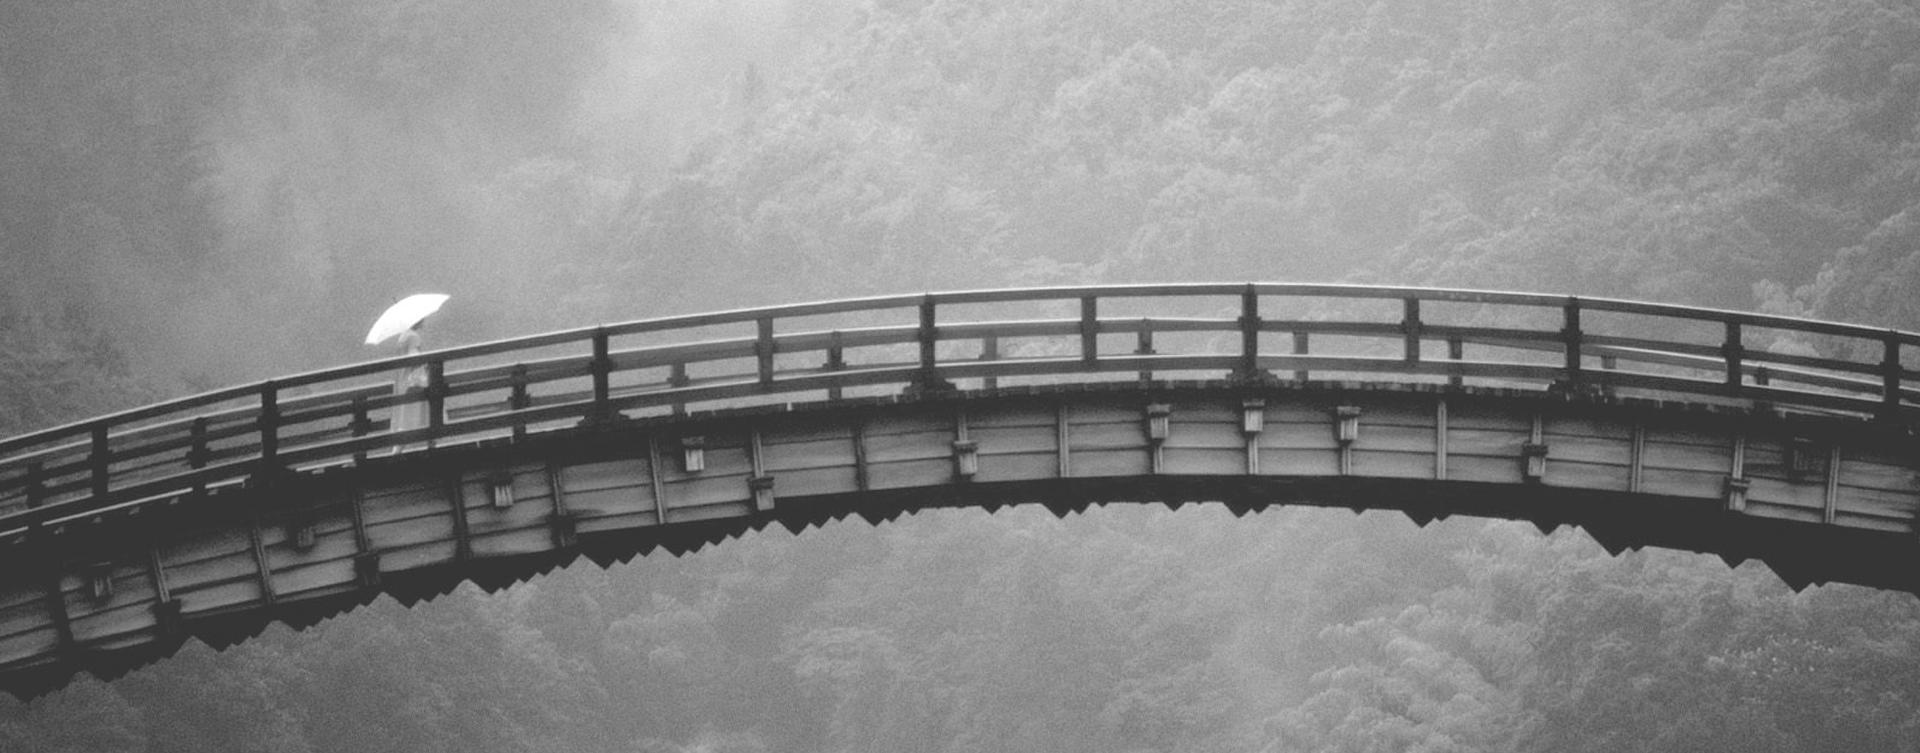 Transmedias_Accompagnement_pont